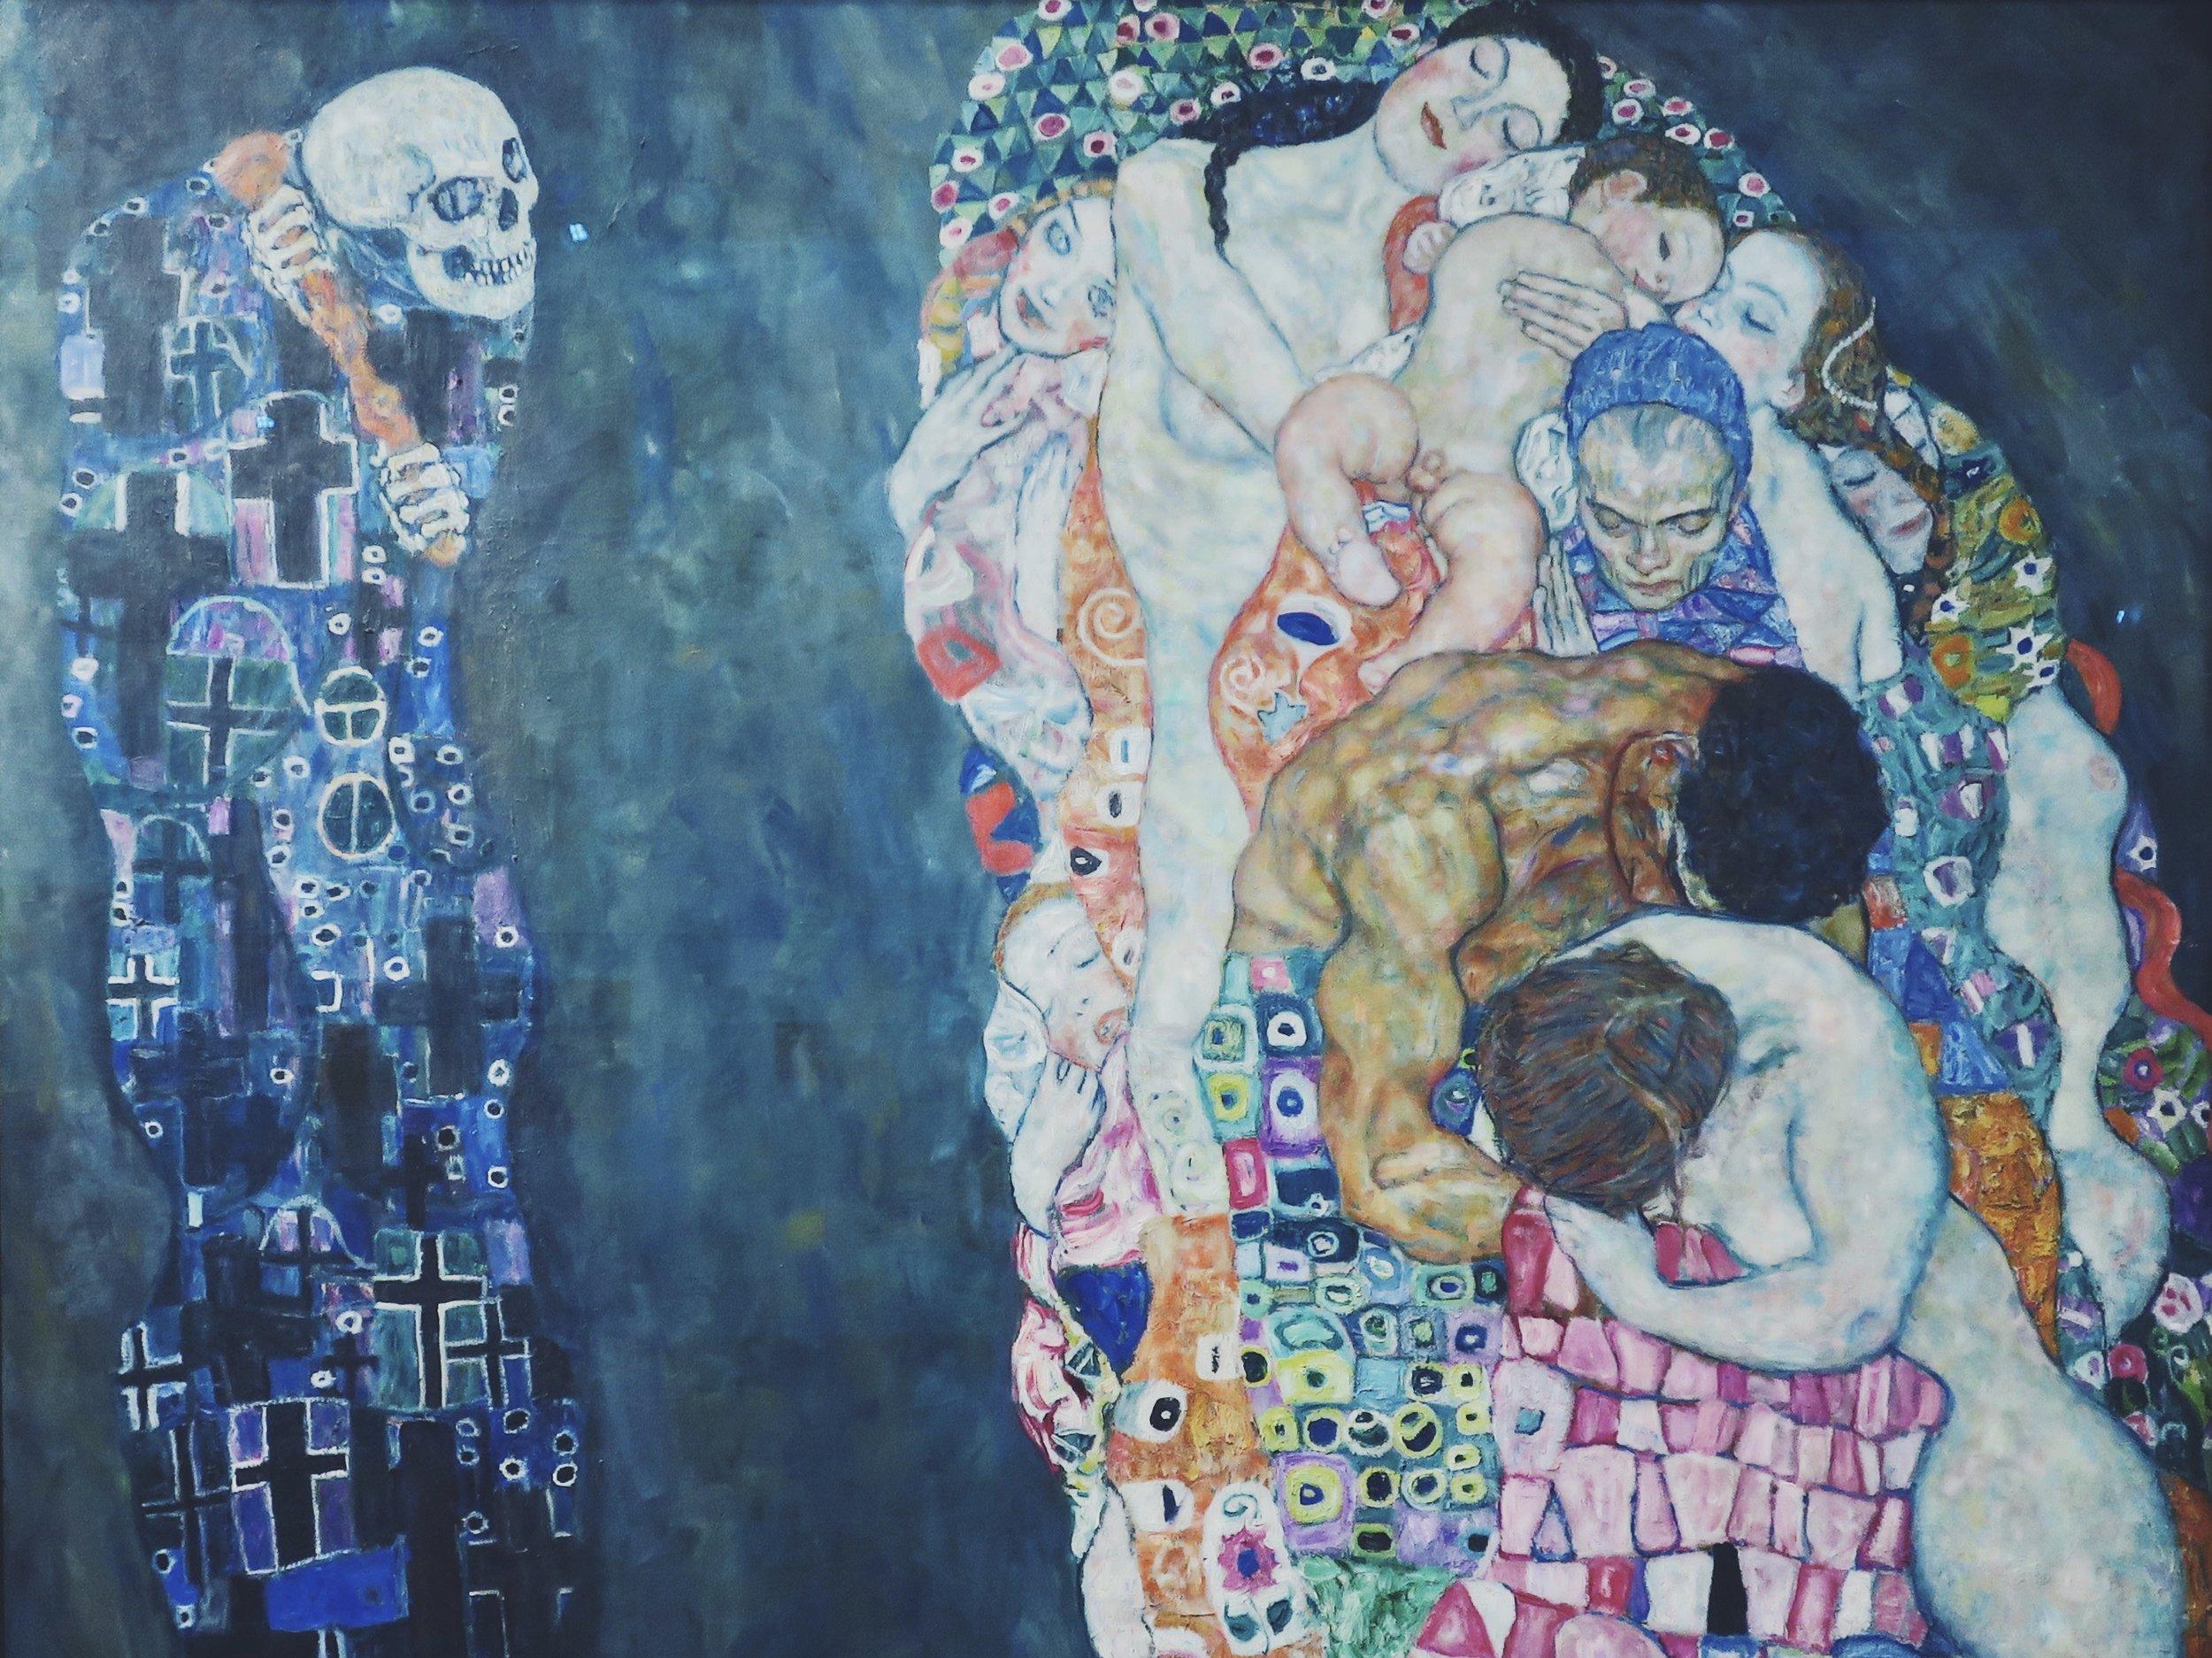 Gustav Klimt's 'Death and Life' (1906-1916)